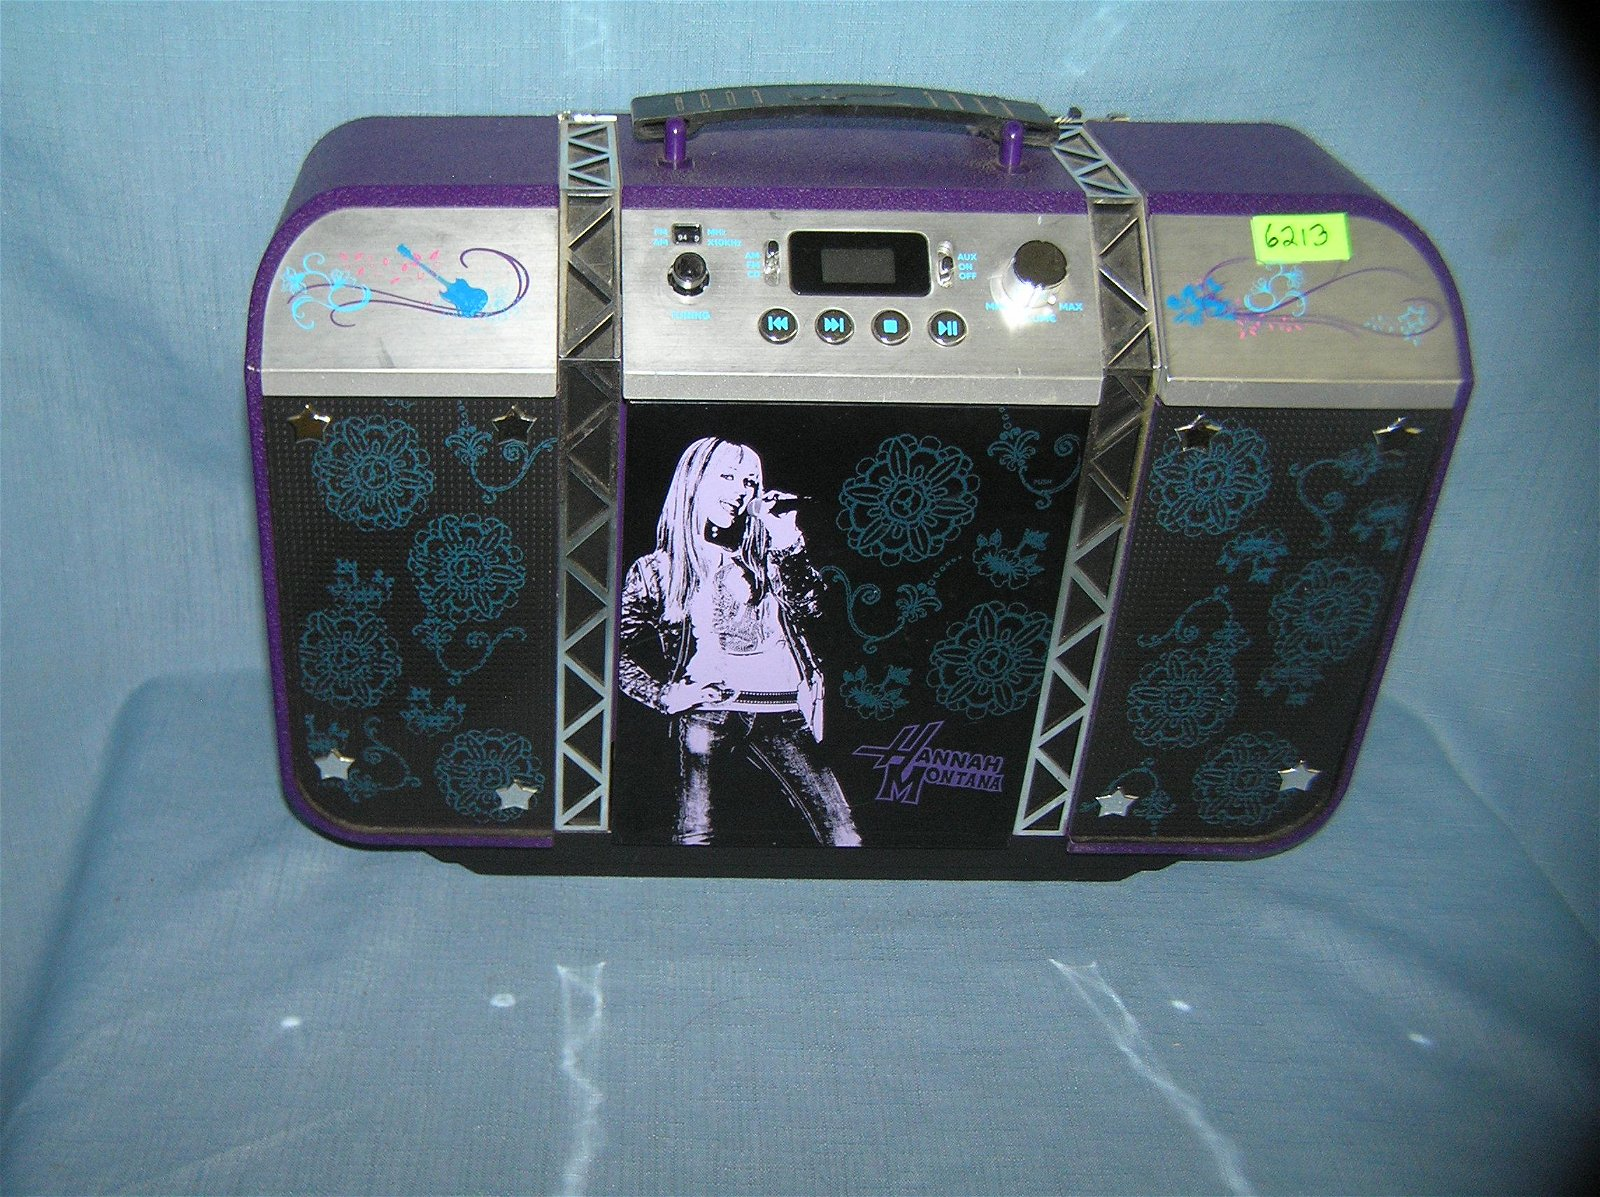 Hannah Montana limited edition boom box